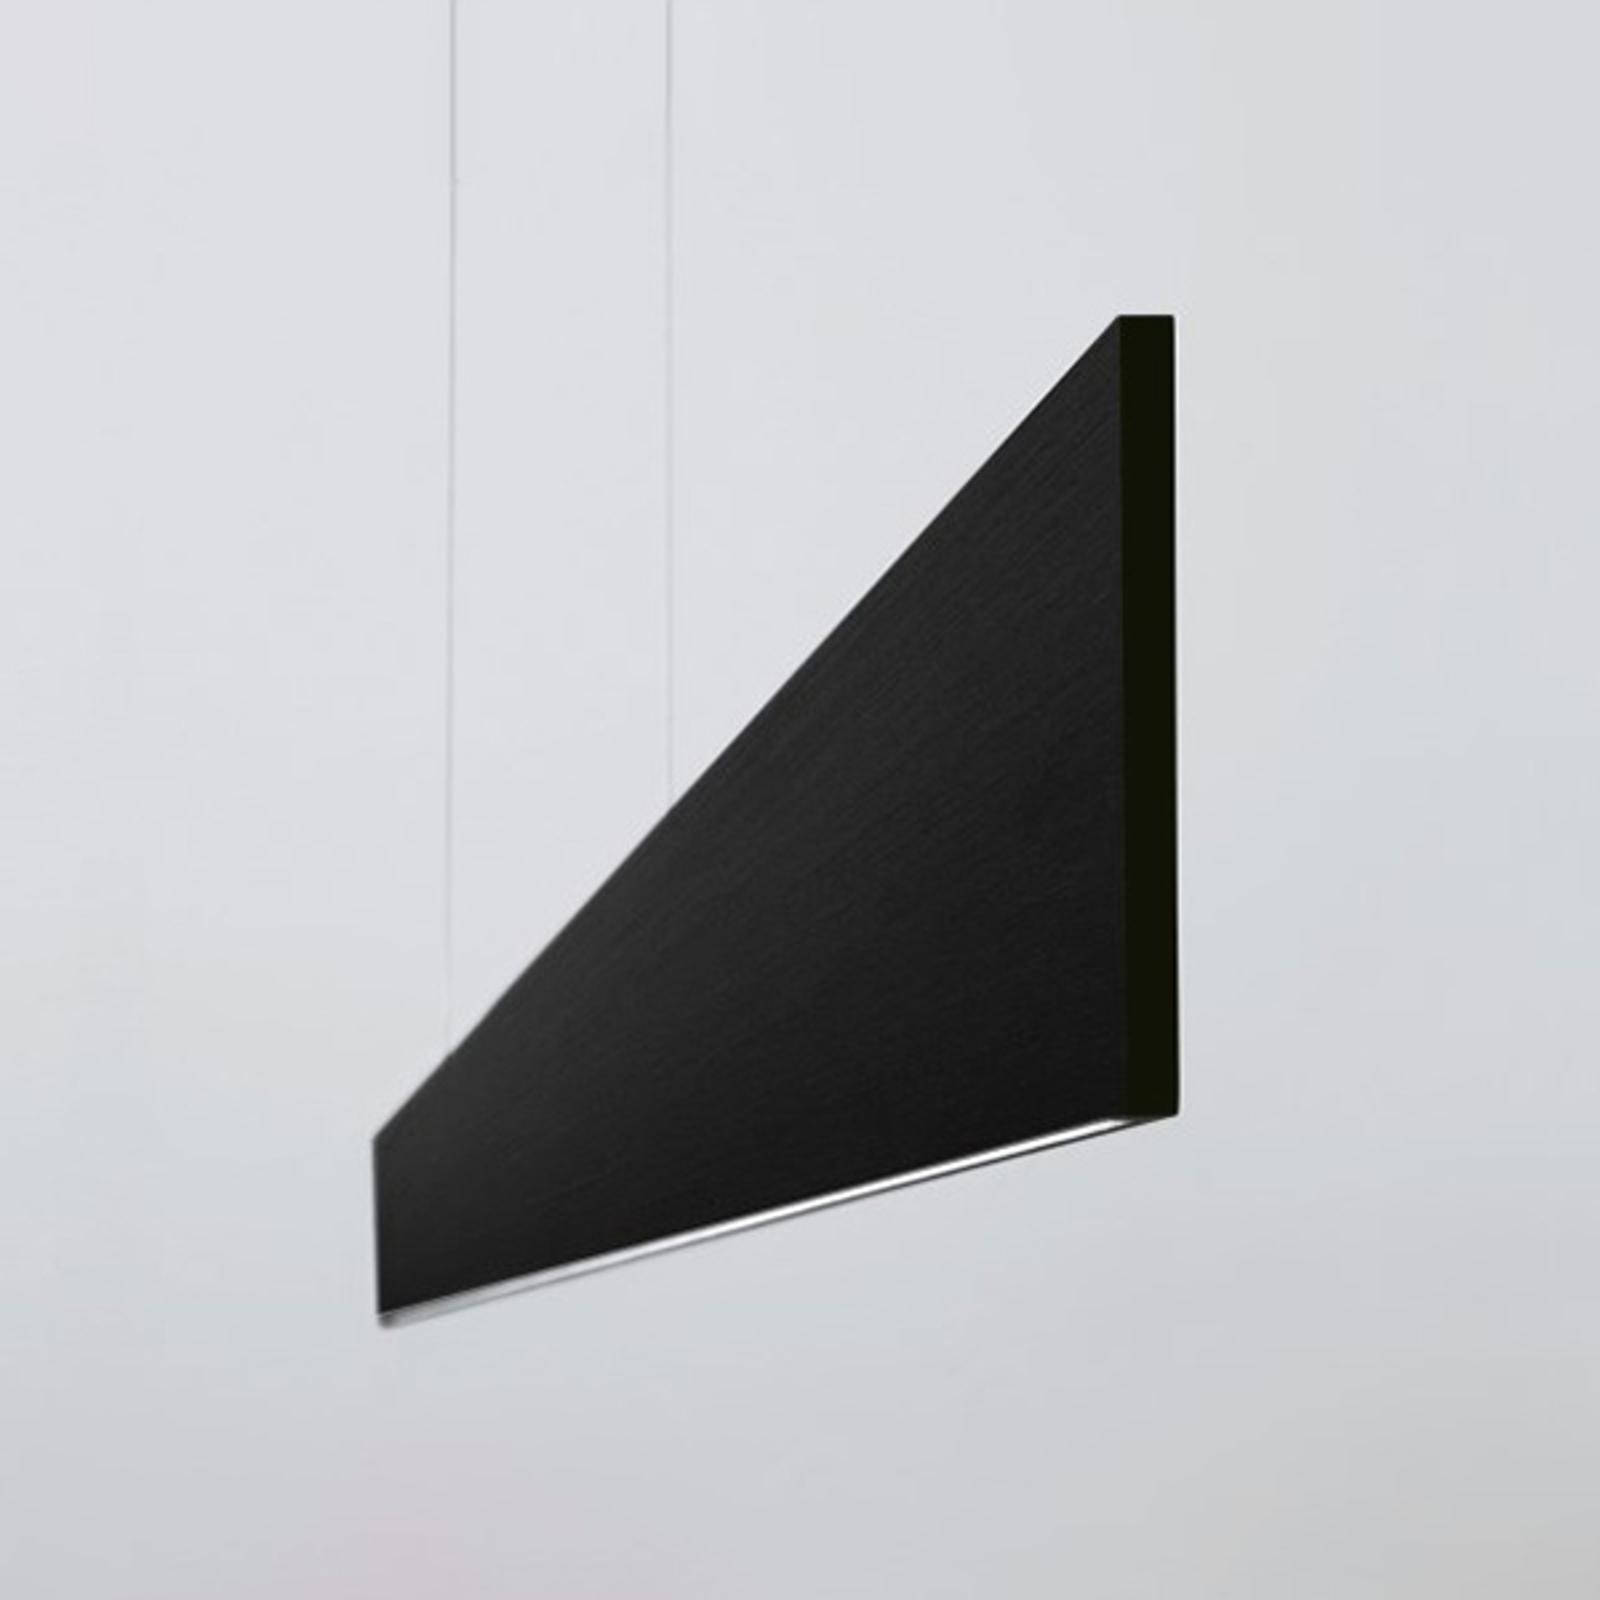 Suspension LED After 8 122cm DALI 4000K noire